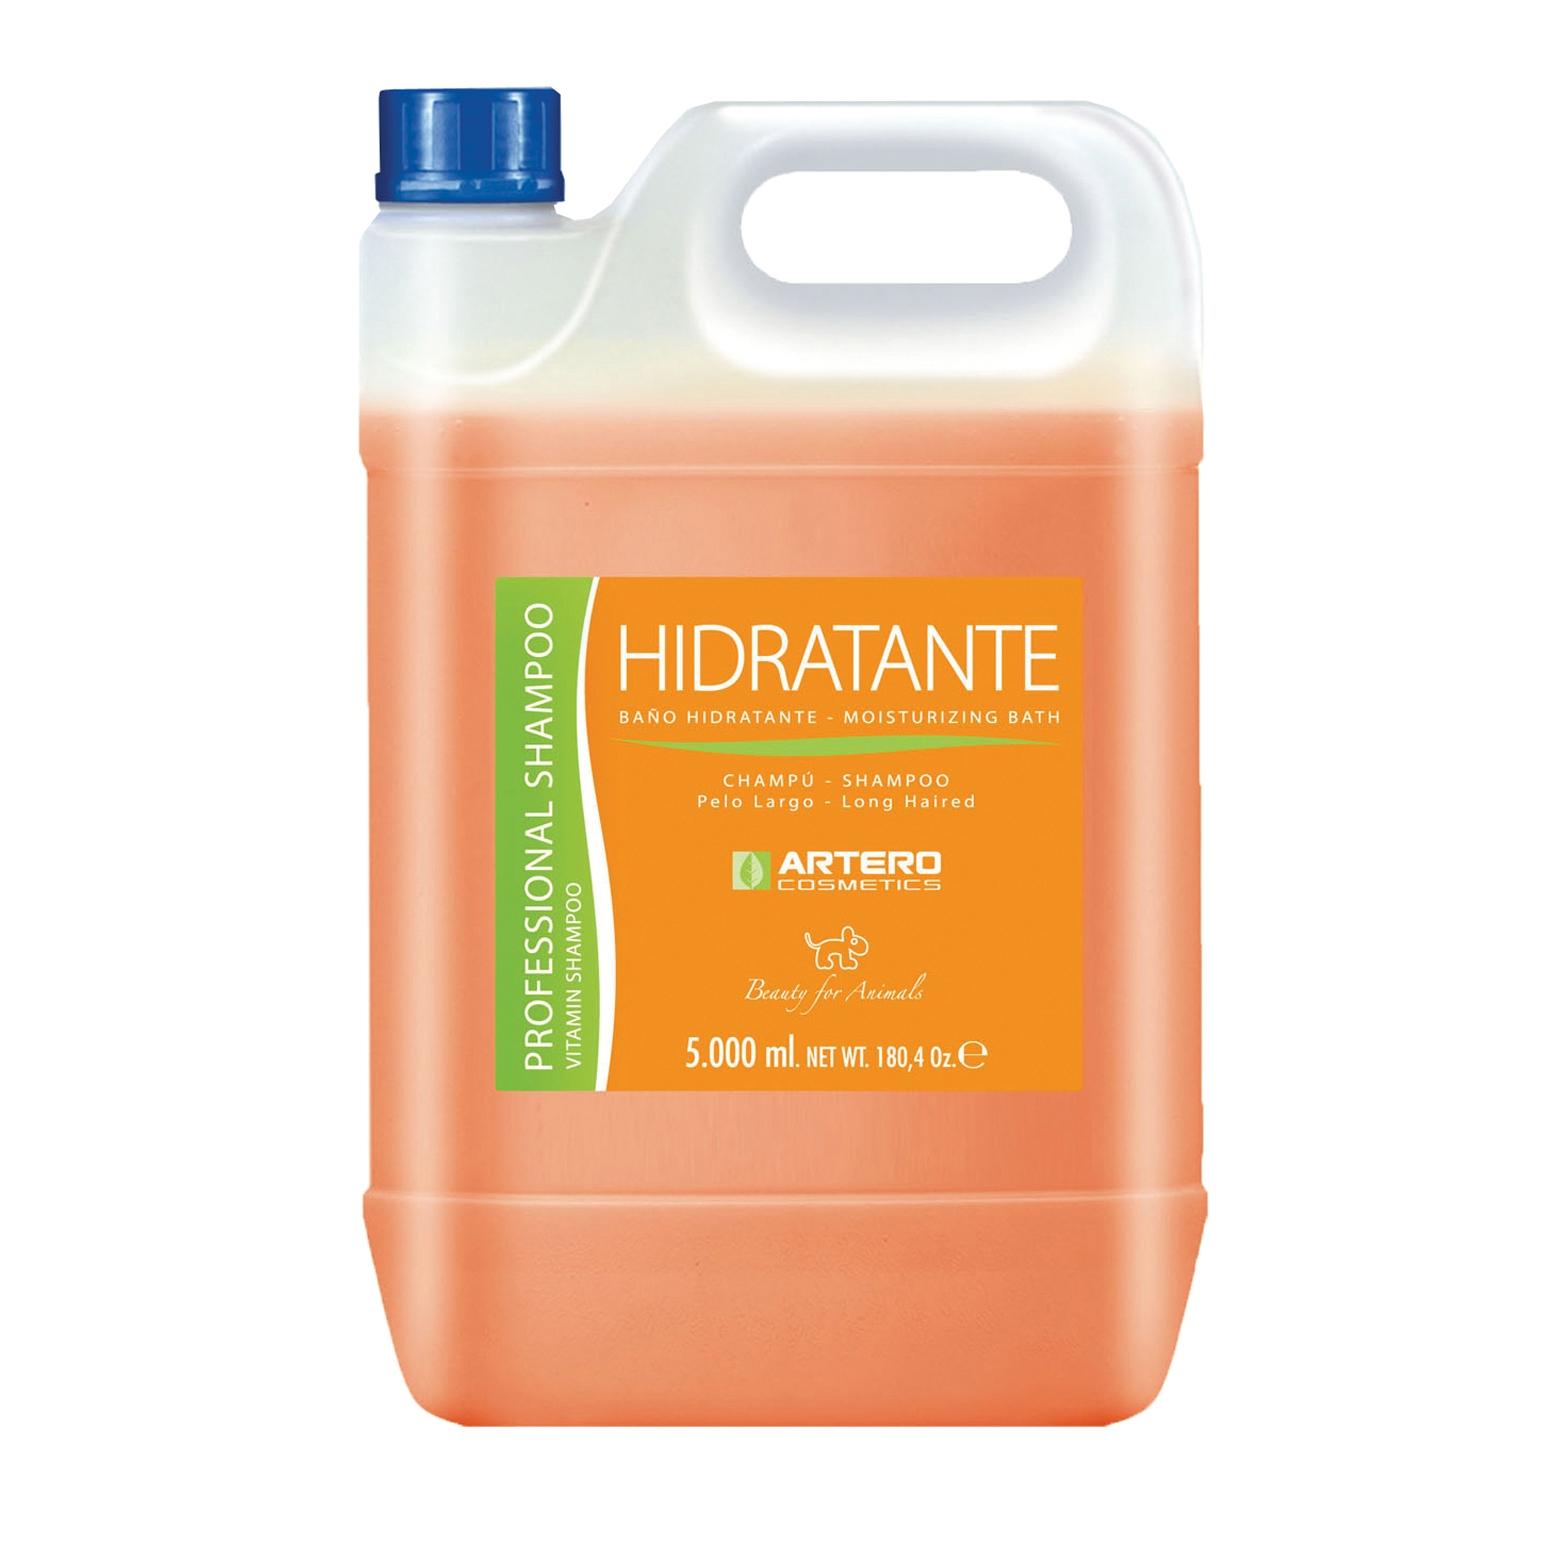 c1066 - Artero Shampoo Hidratante 5L